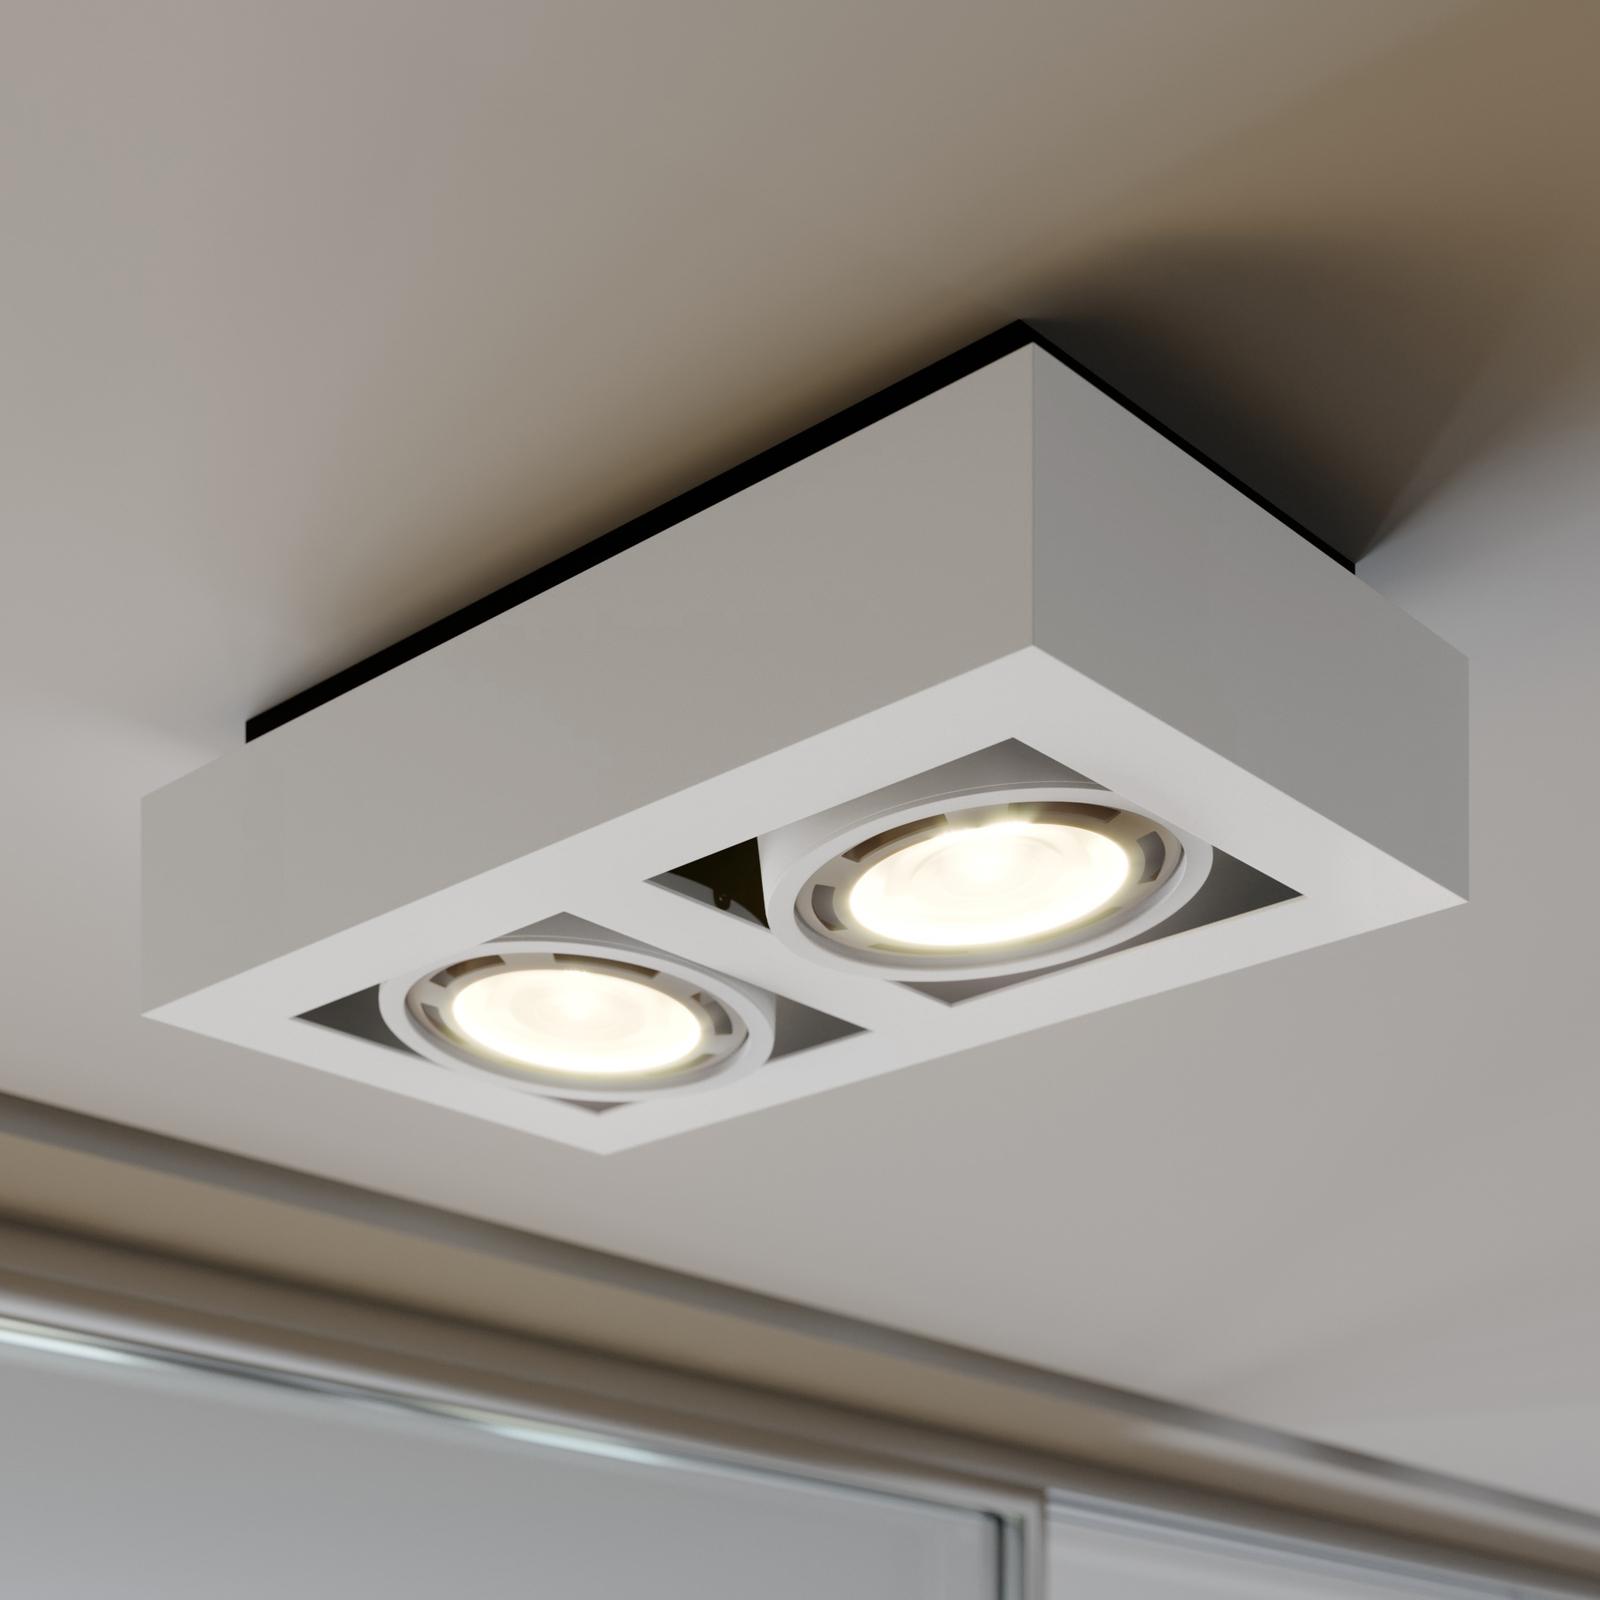 LED-Deckenstrahler Ronka, GU10, 2-fl., weiß